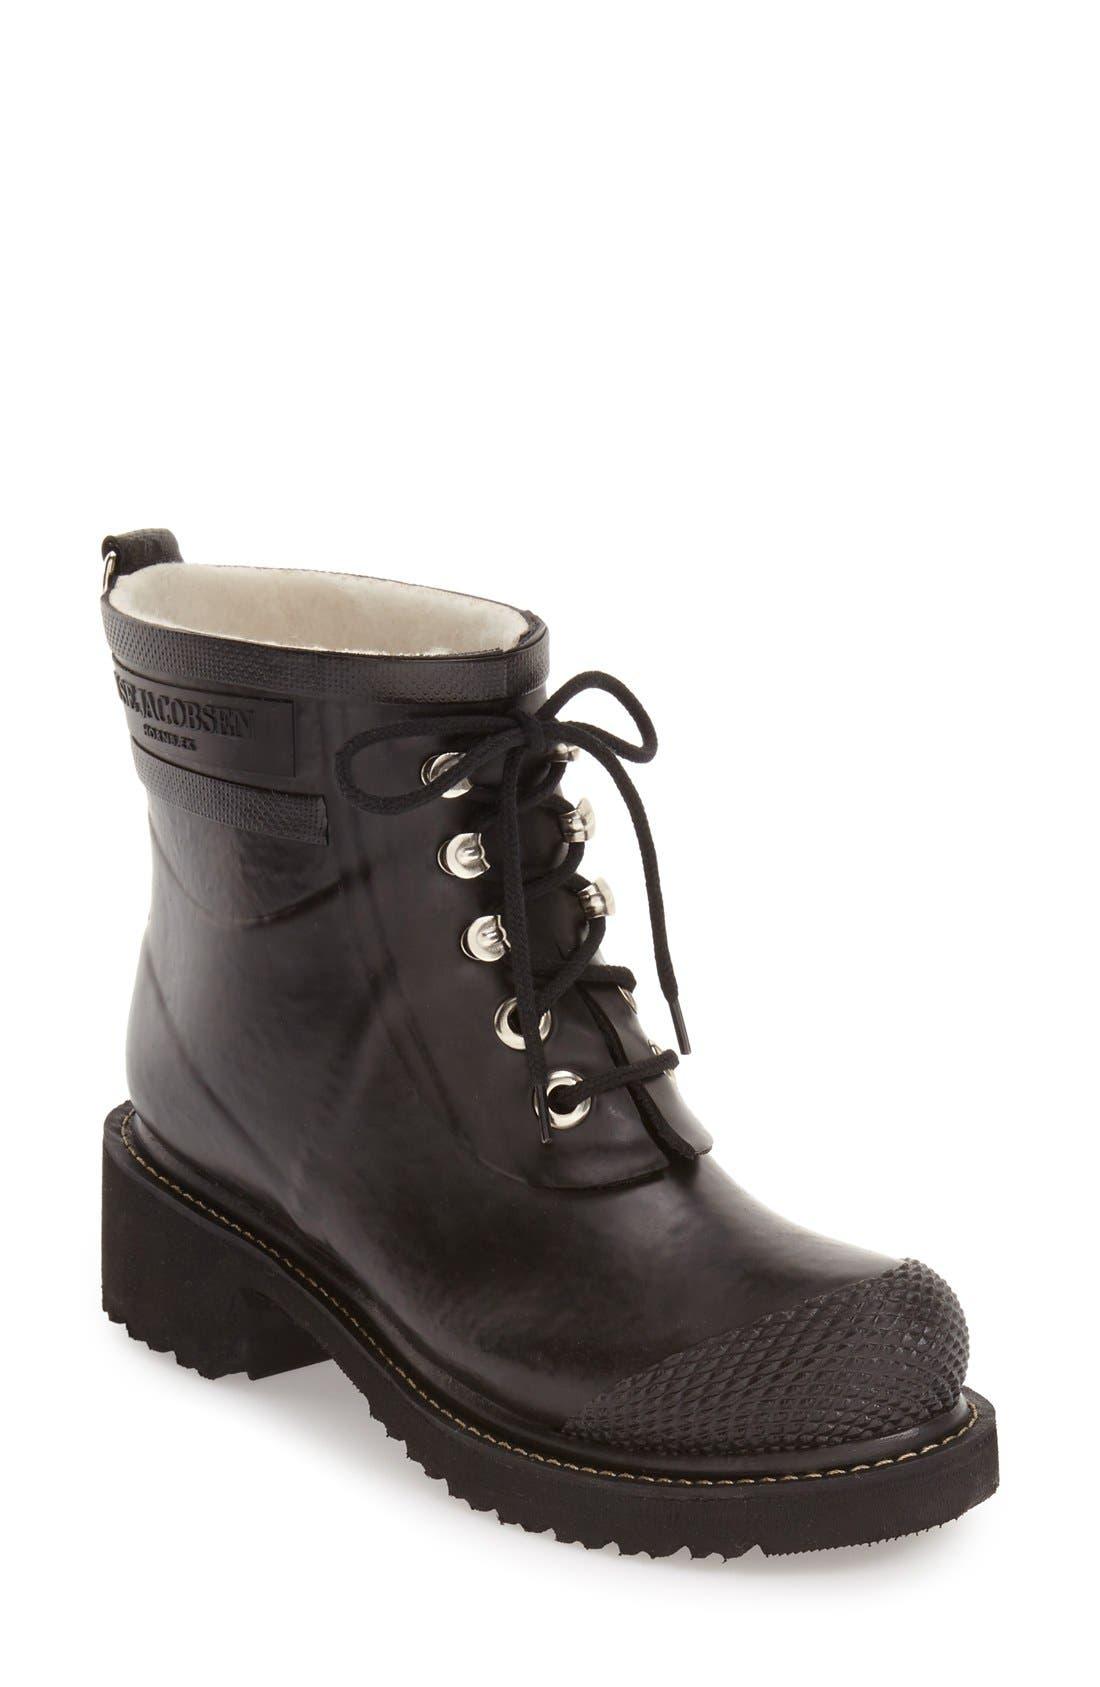 Ilse Jacobsen Waterproof Lace-Up Short Snow/Rain Boot (Women)